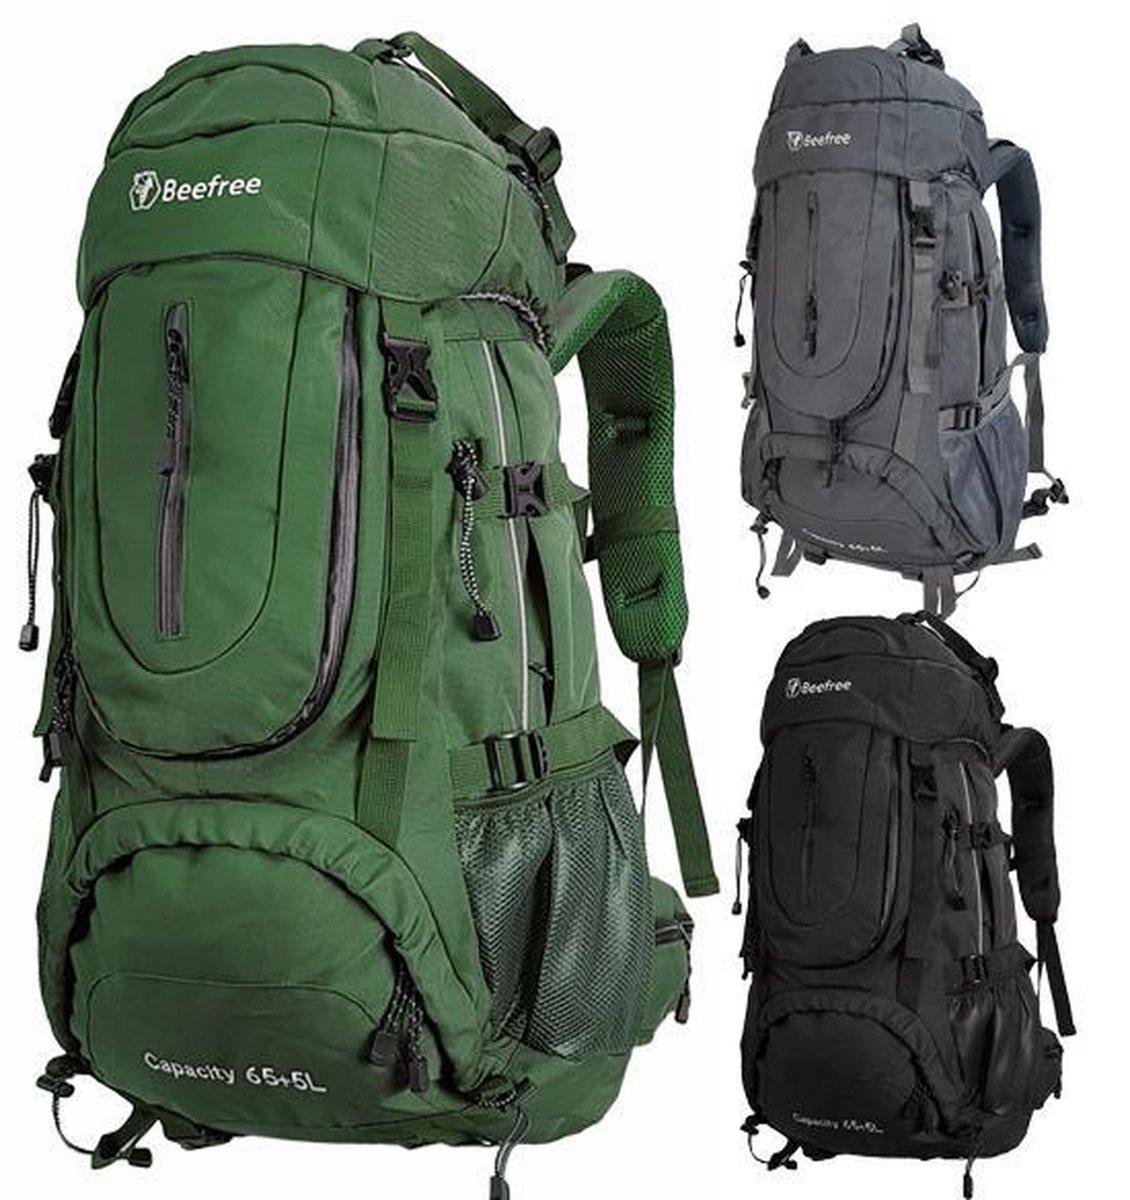 Beefree 70 Liter Backpack   Inclusief regenhoes   Frontlader   Extra stevig   Updated 2019 model   G